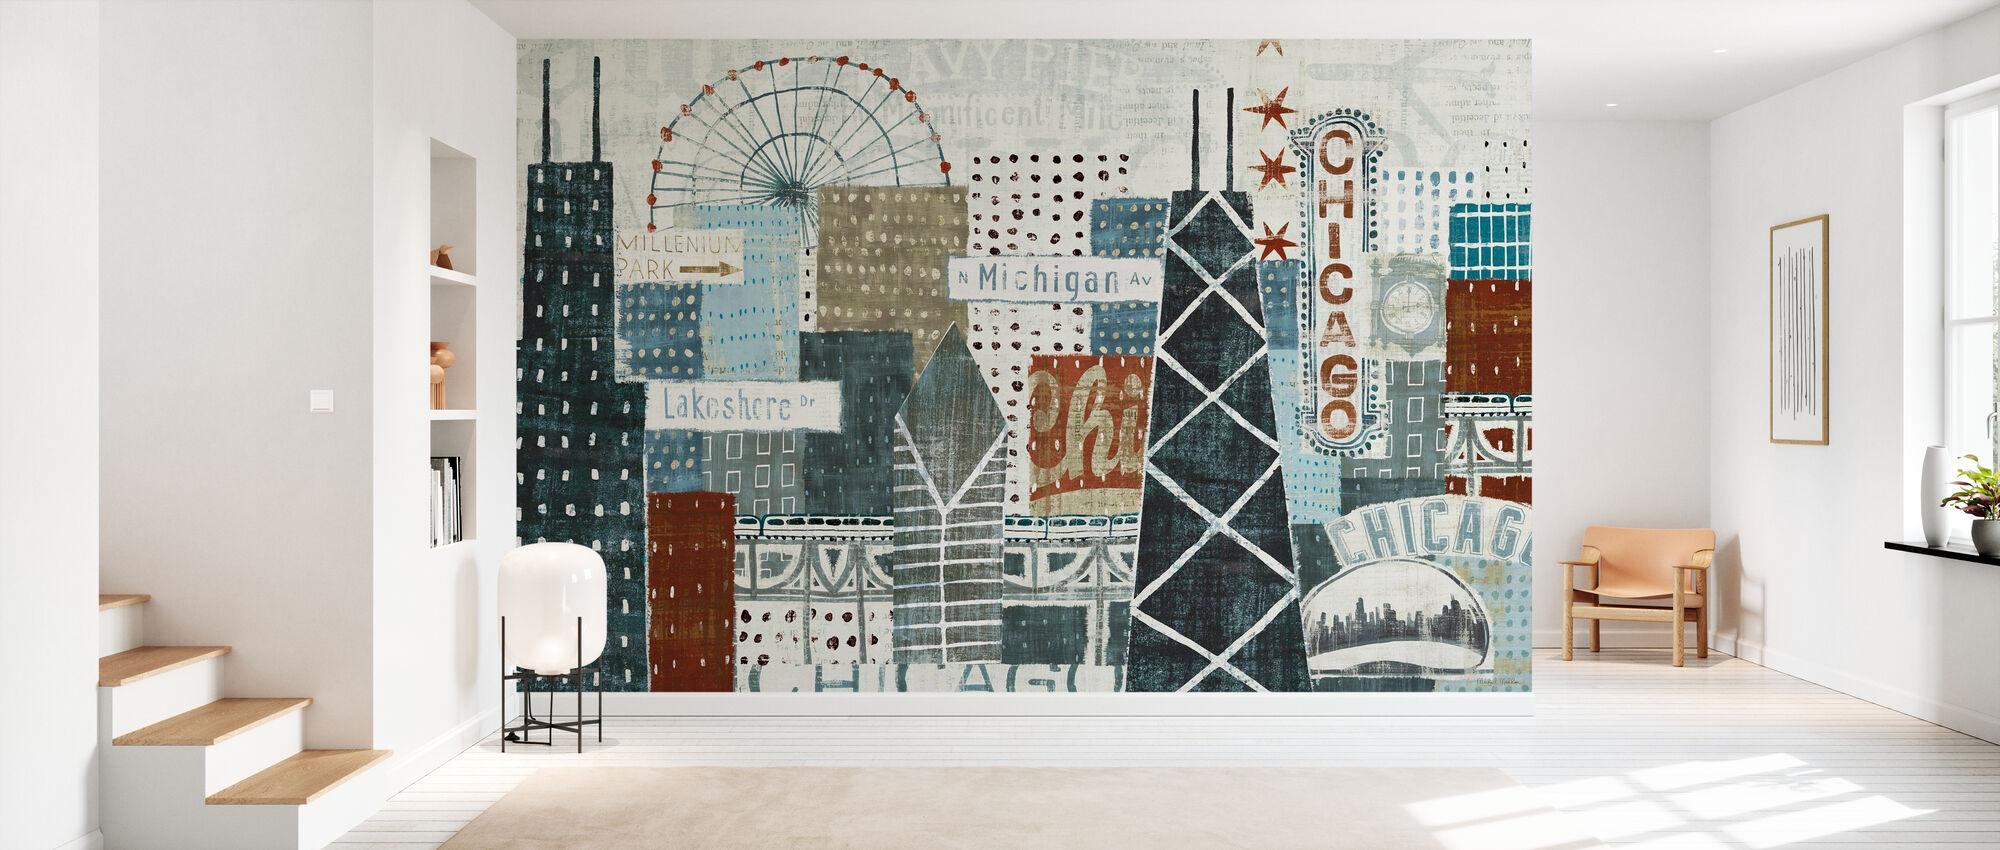 Hey Chicago - Wallpaper - Hallway